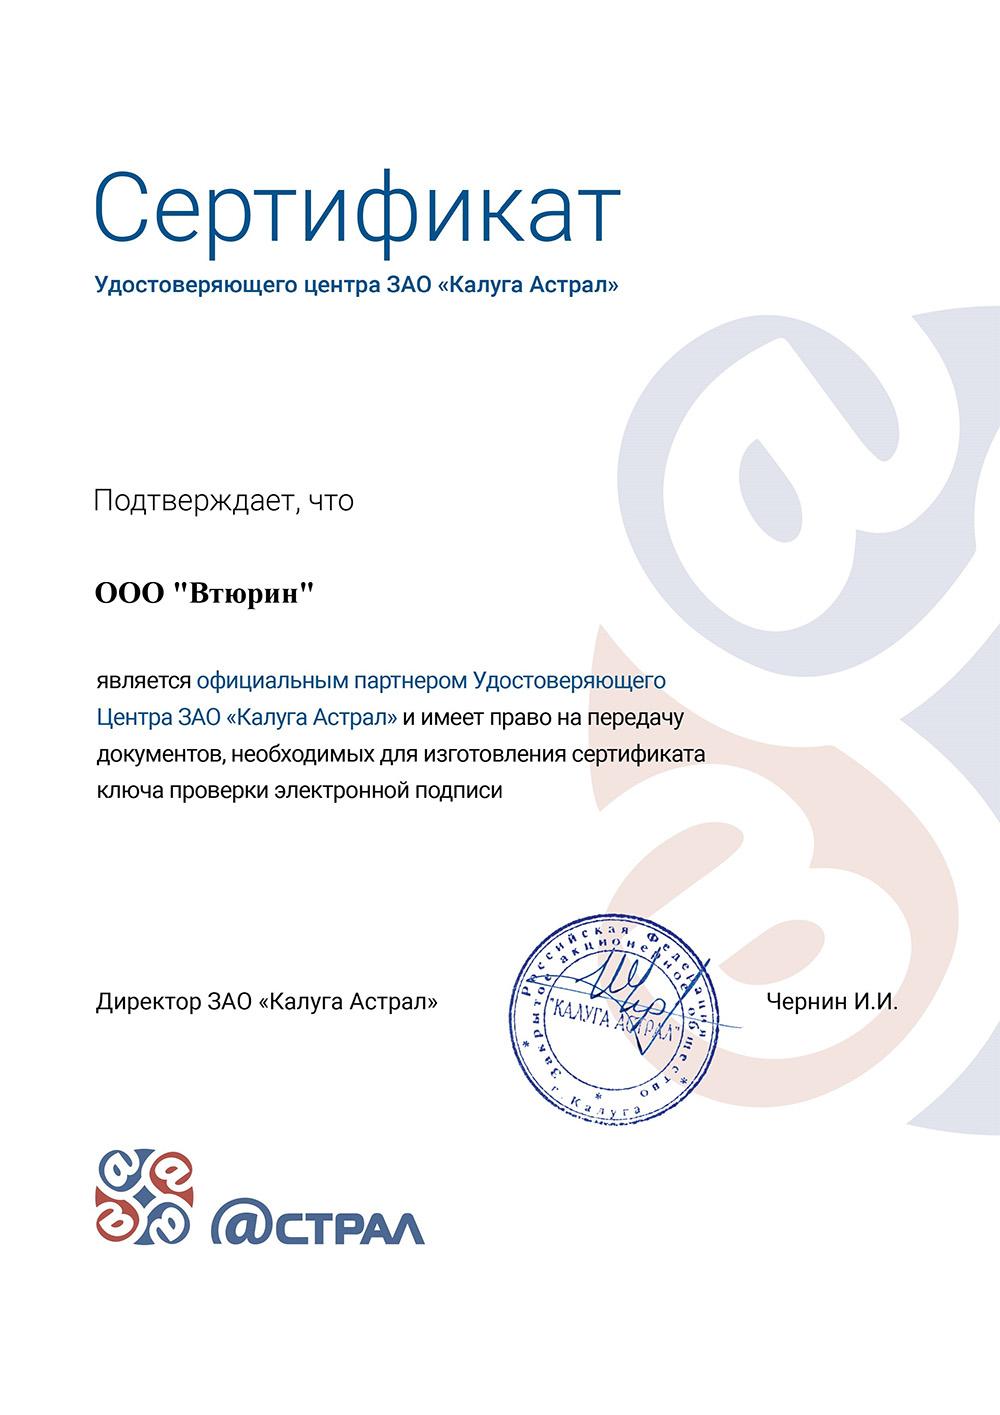 Сертификат катулага-астрал